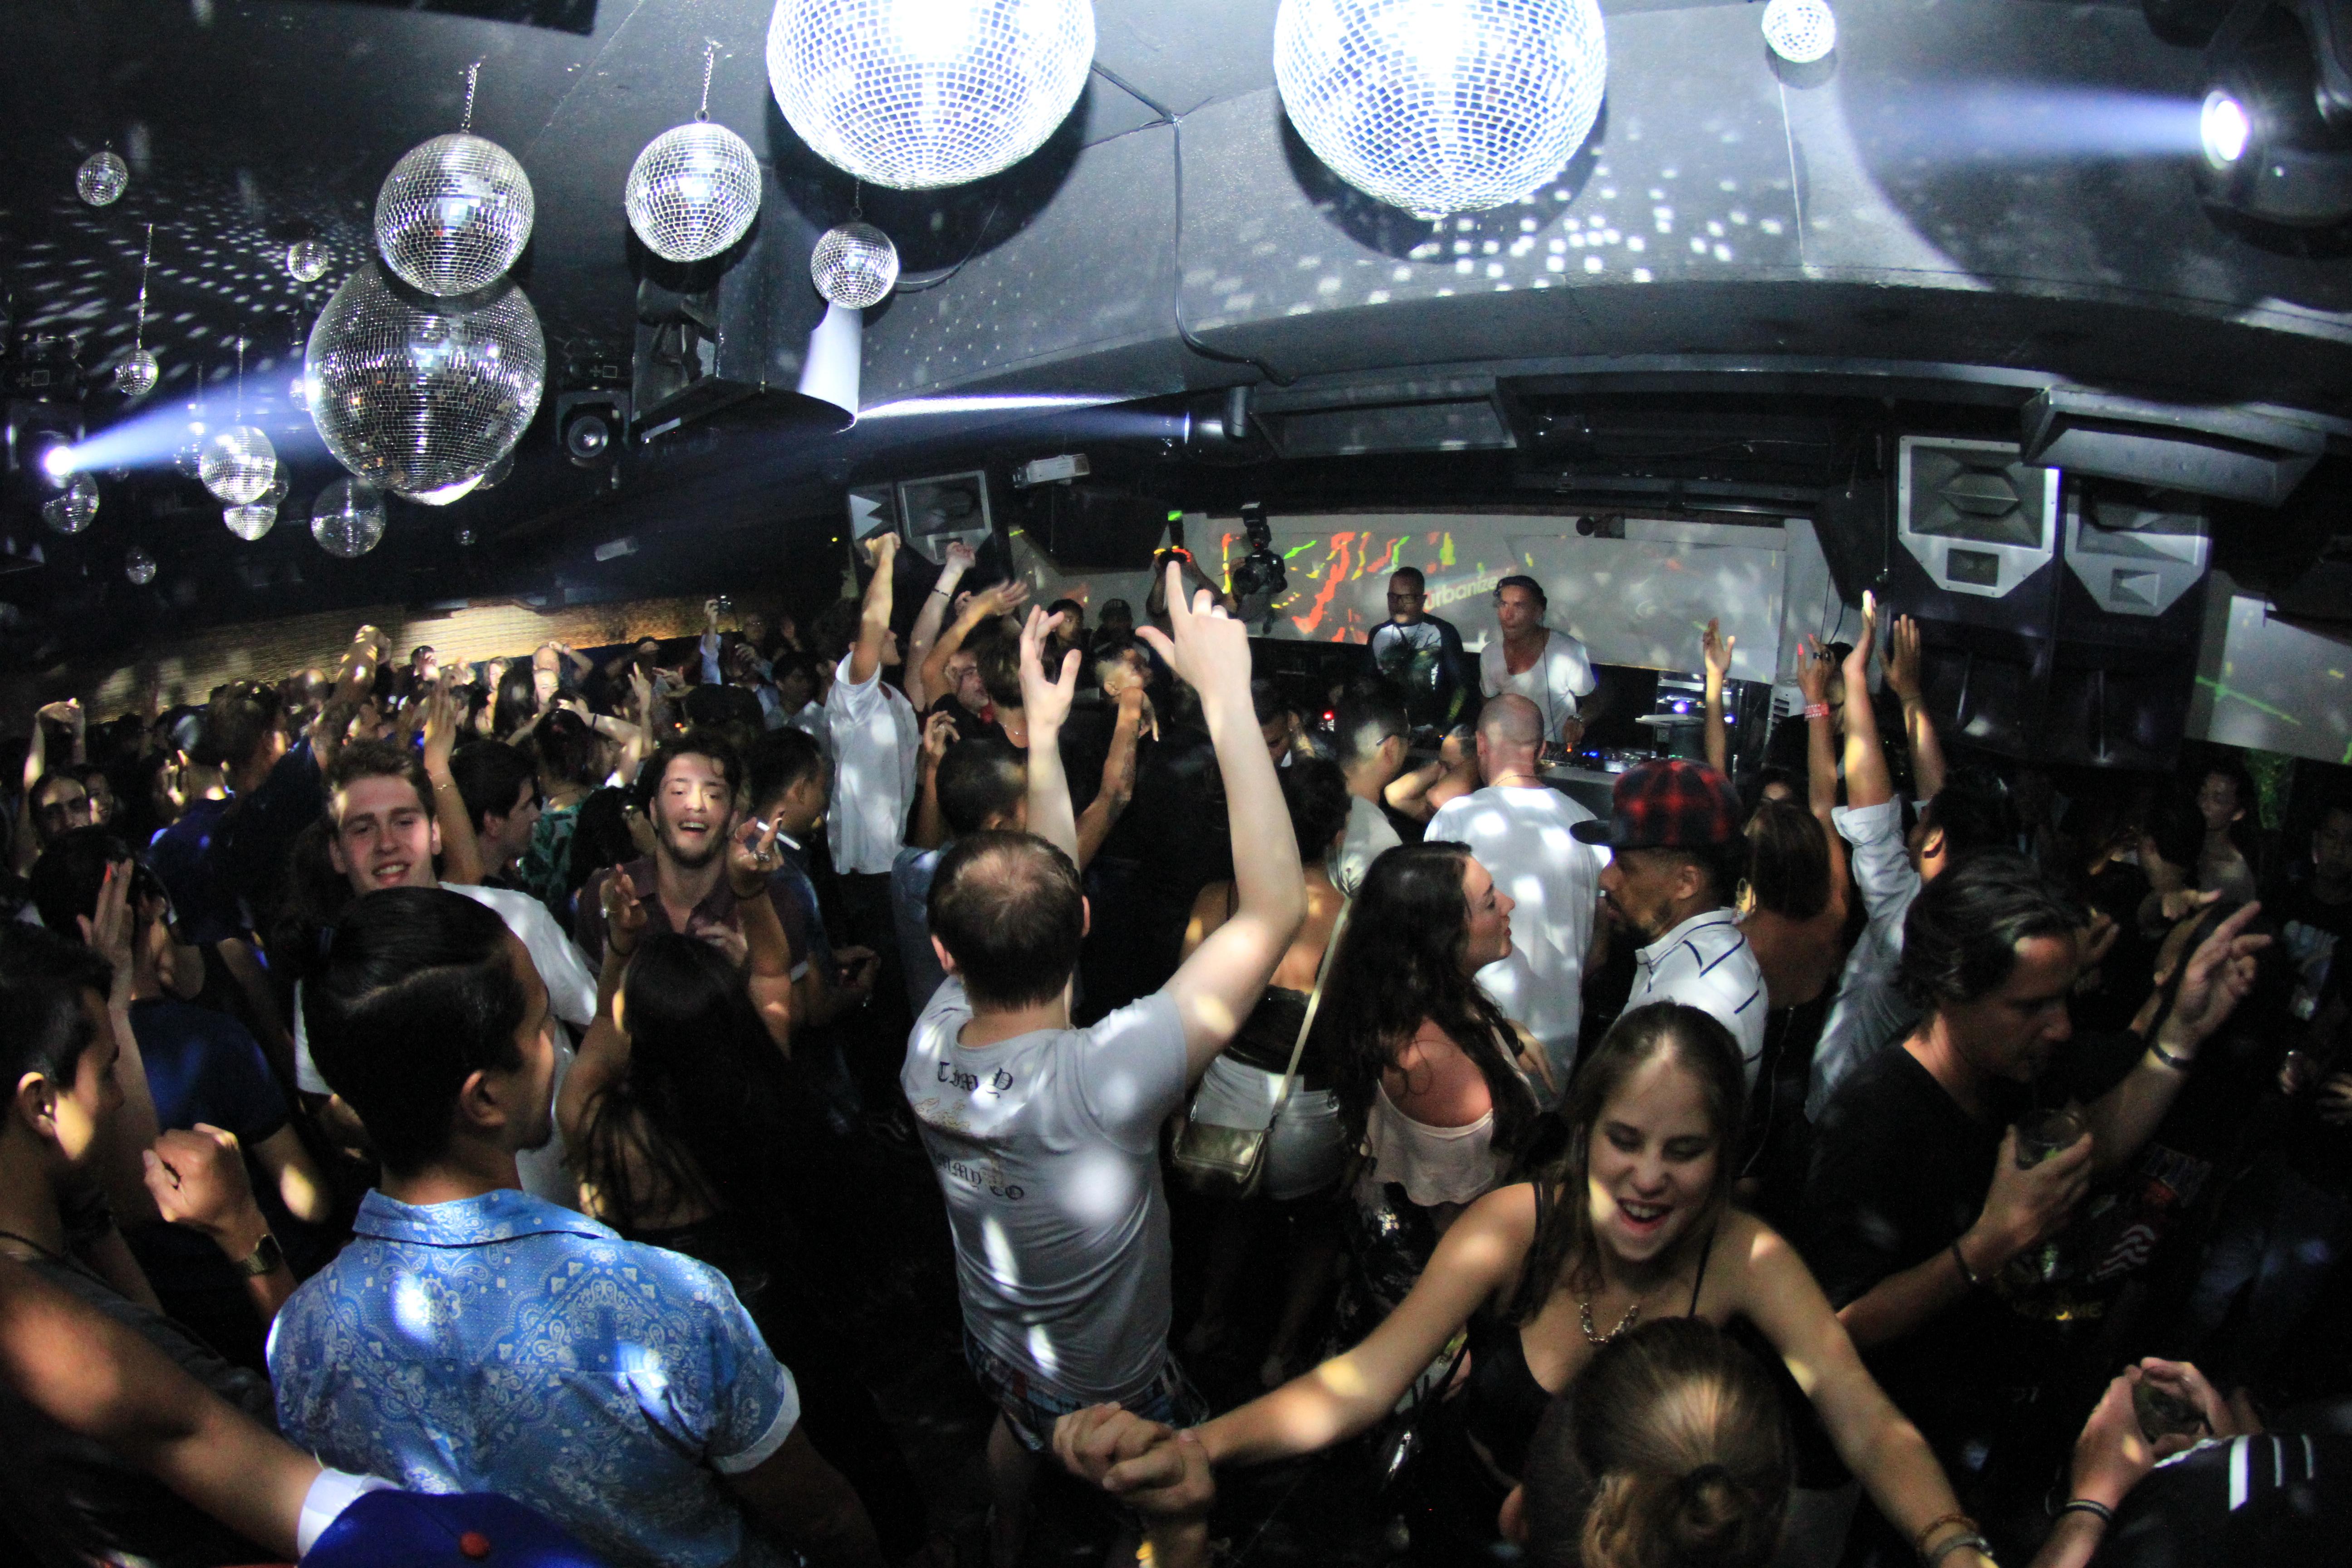 Jenja nightclub